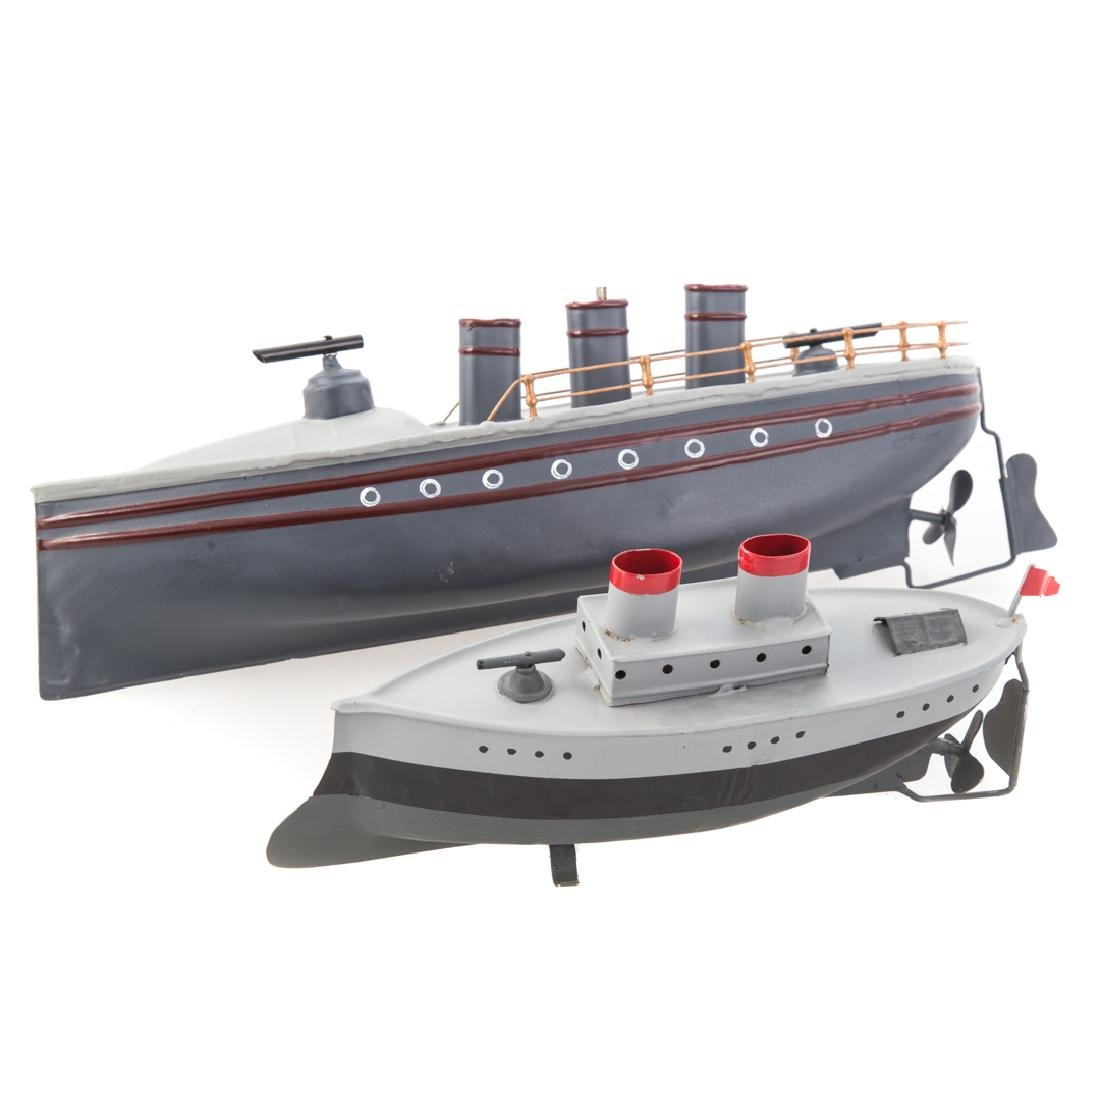 Carette torpedo boat and Fleischmann gunboat